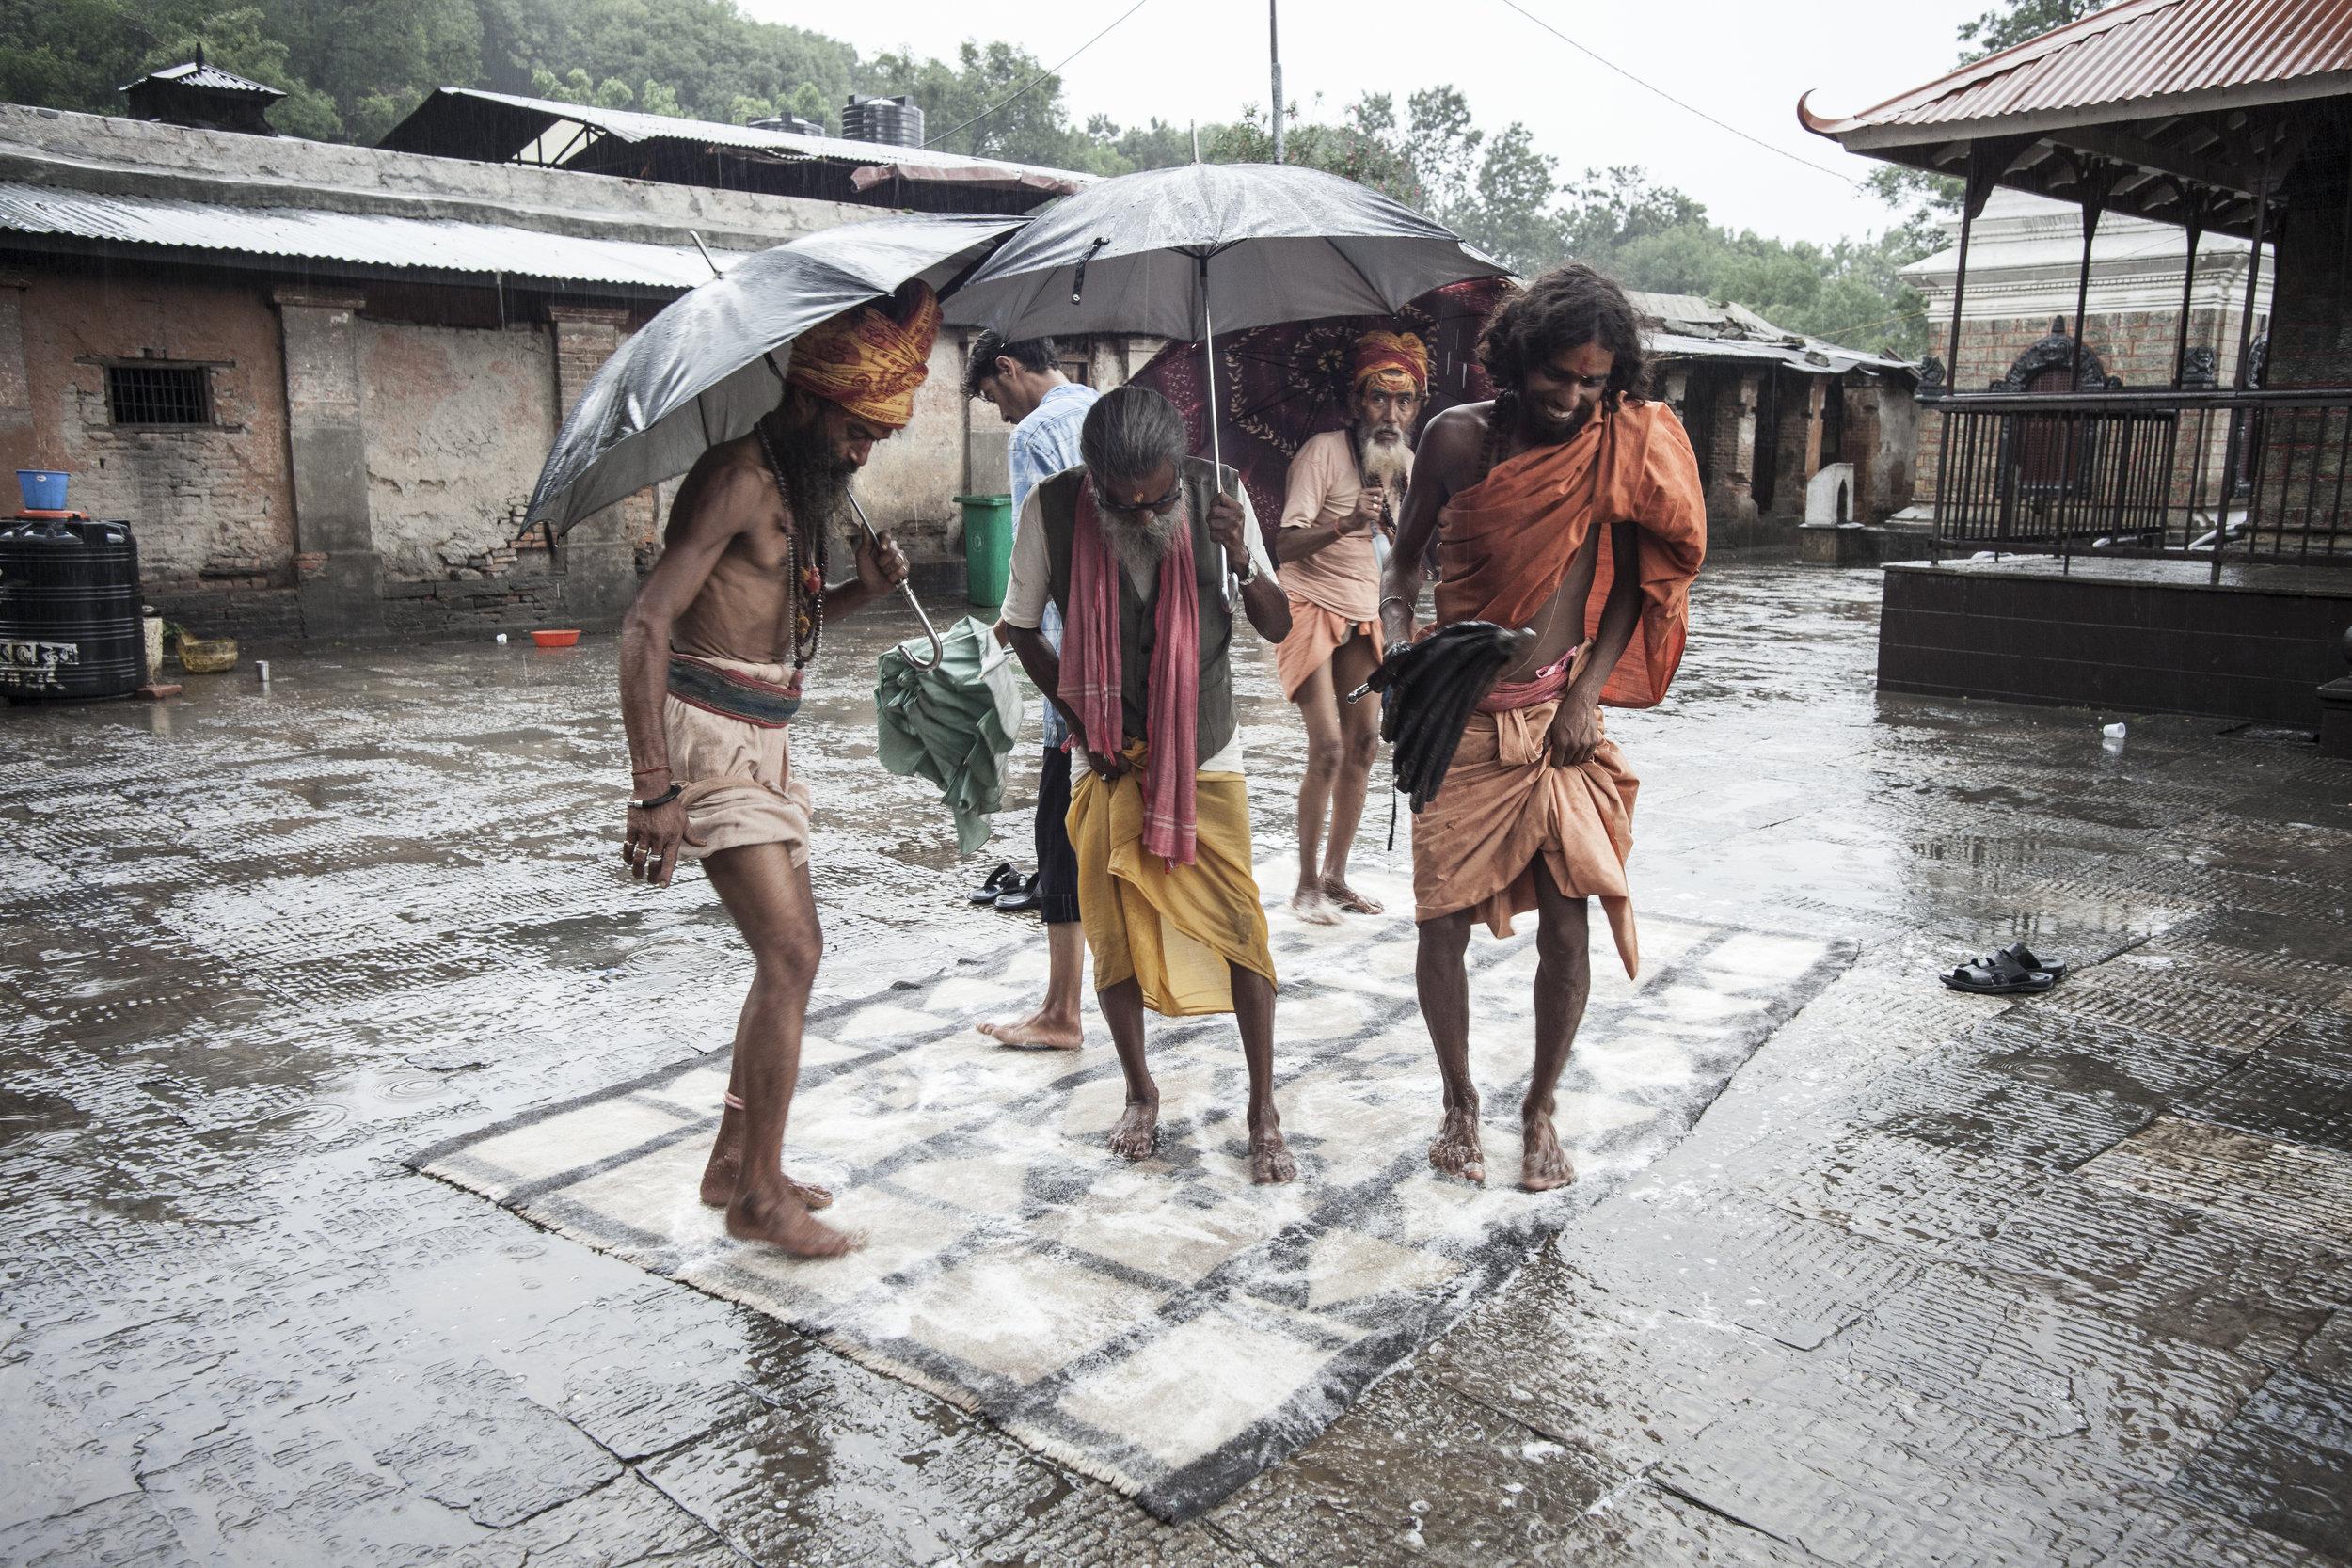 Reportage_Sadhus_Nepal_2012_34.jpg